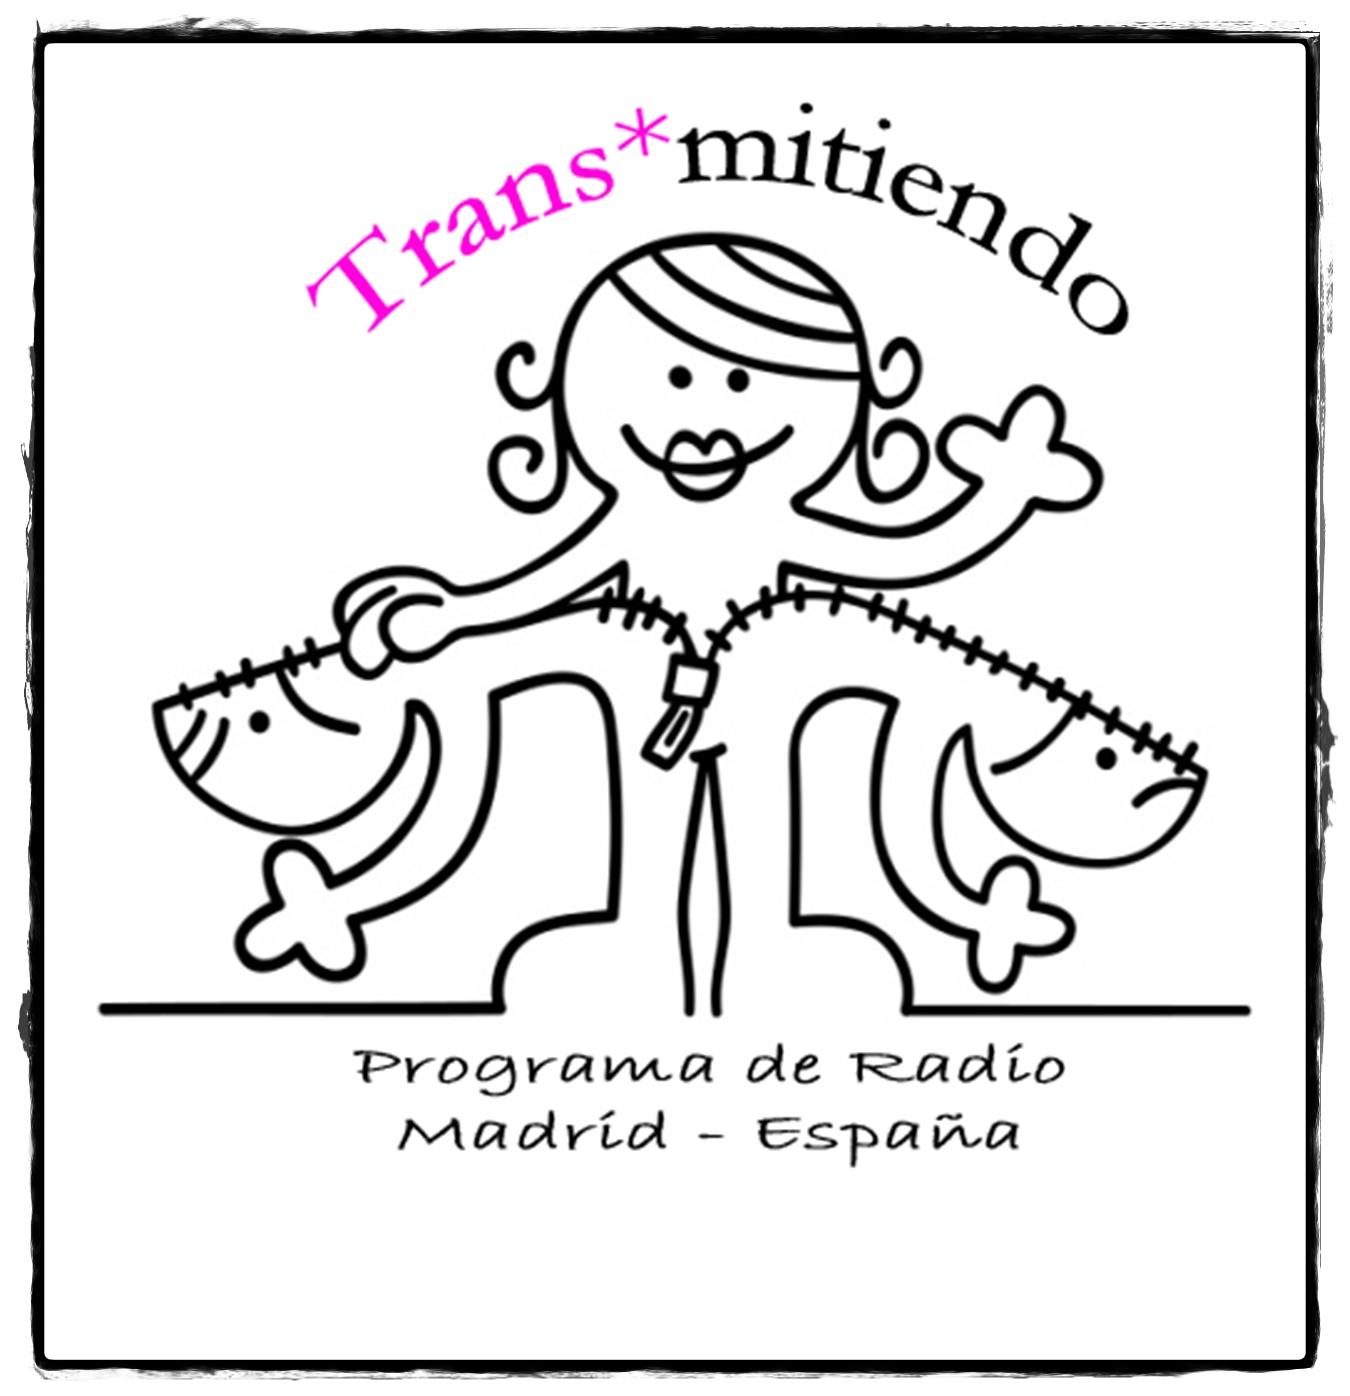 Logo_Transmitiendo_01